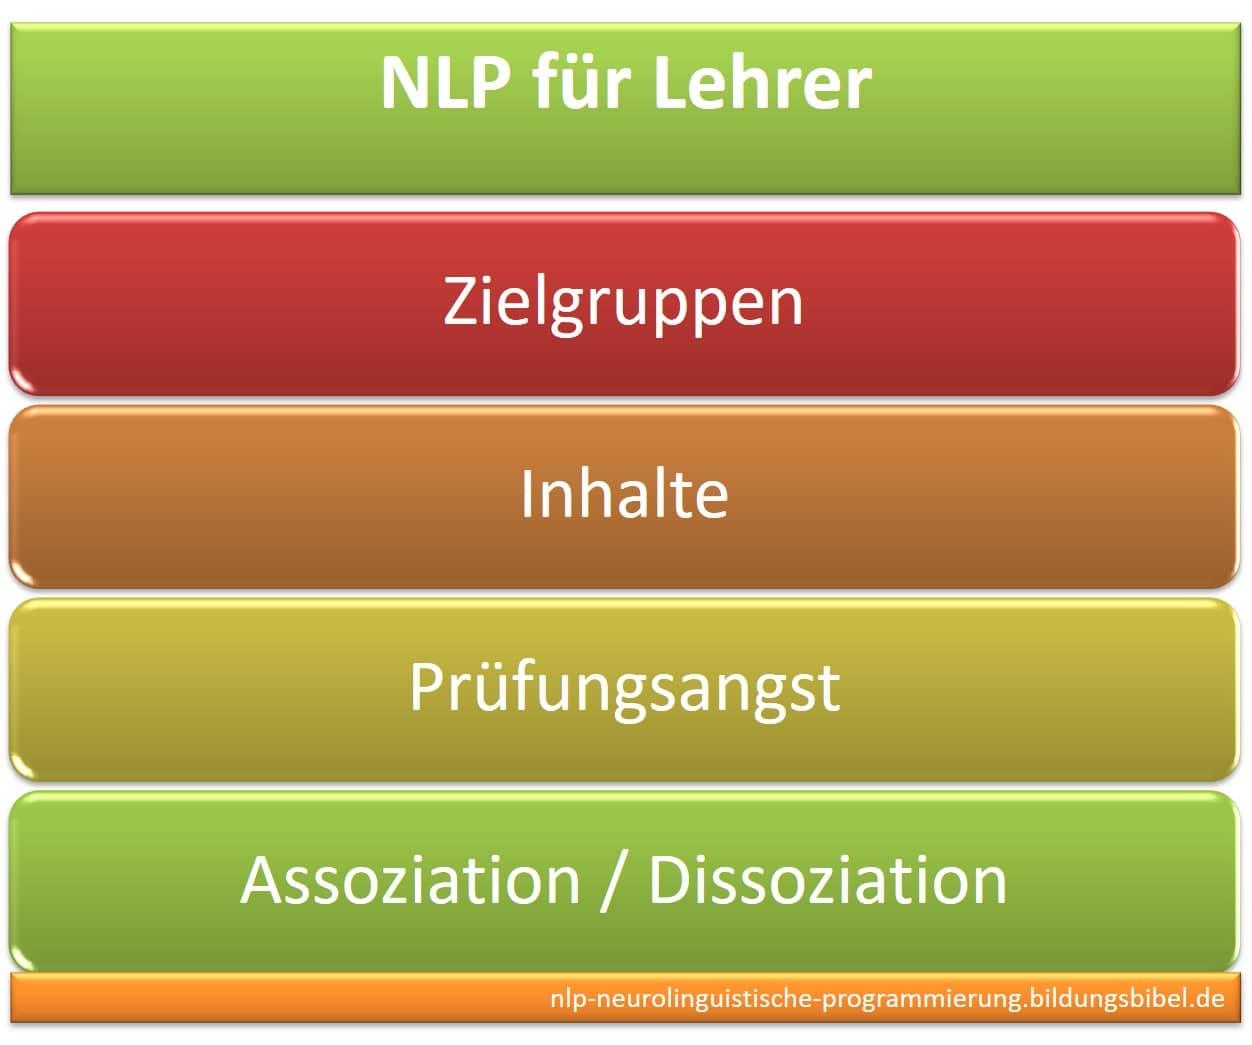 NLP Lehrer Seminar, Pädagogik, Weiterbildung, Fortbildung